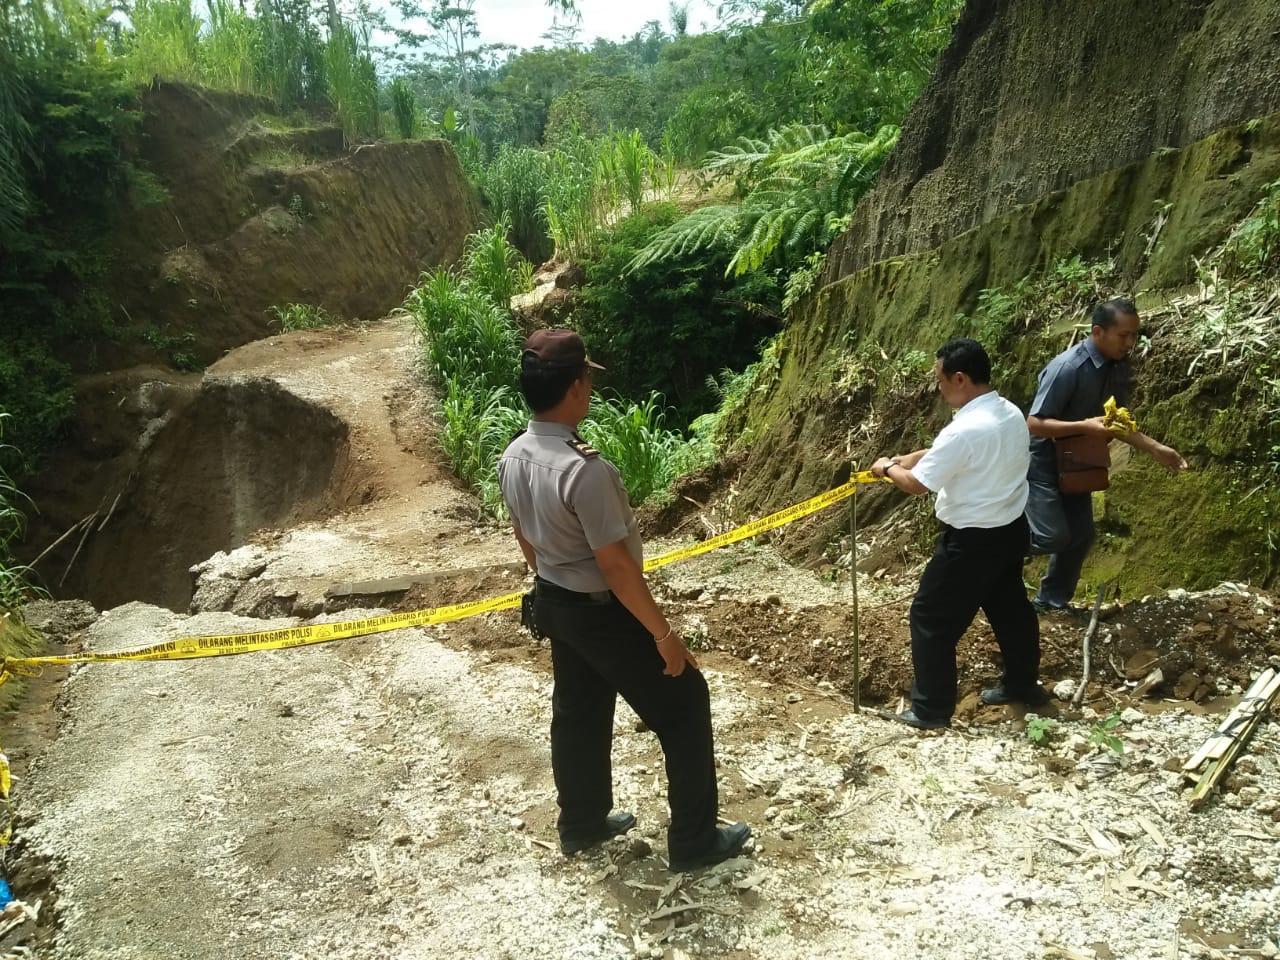 JAJARAN Polsek Payangan, Gianyar memasang police line di lokasi longsor di Banjar Penyabangan, Desa Kerta, Senin (2/3/2020). Foto: kadek adiputra wirawan